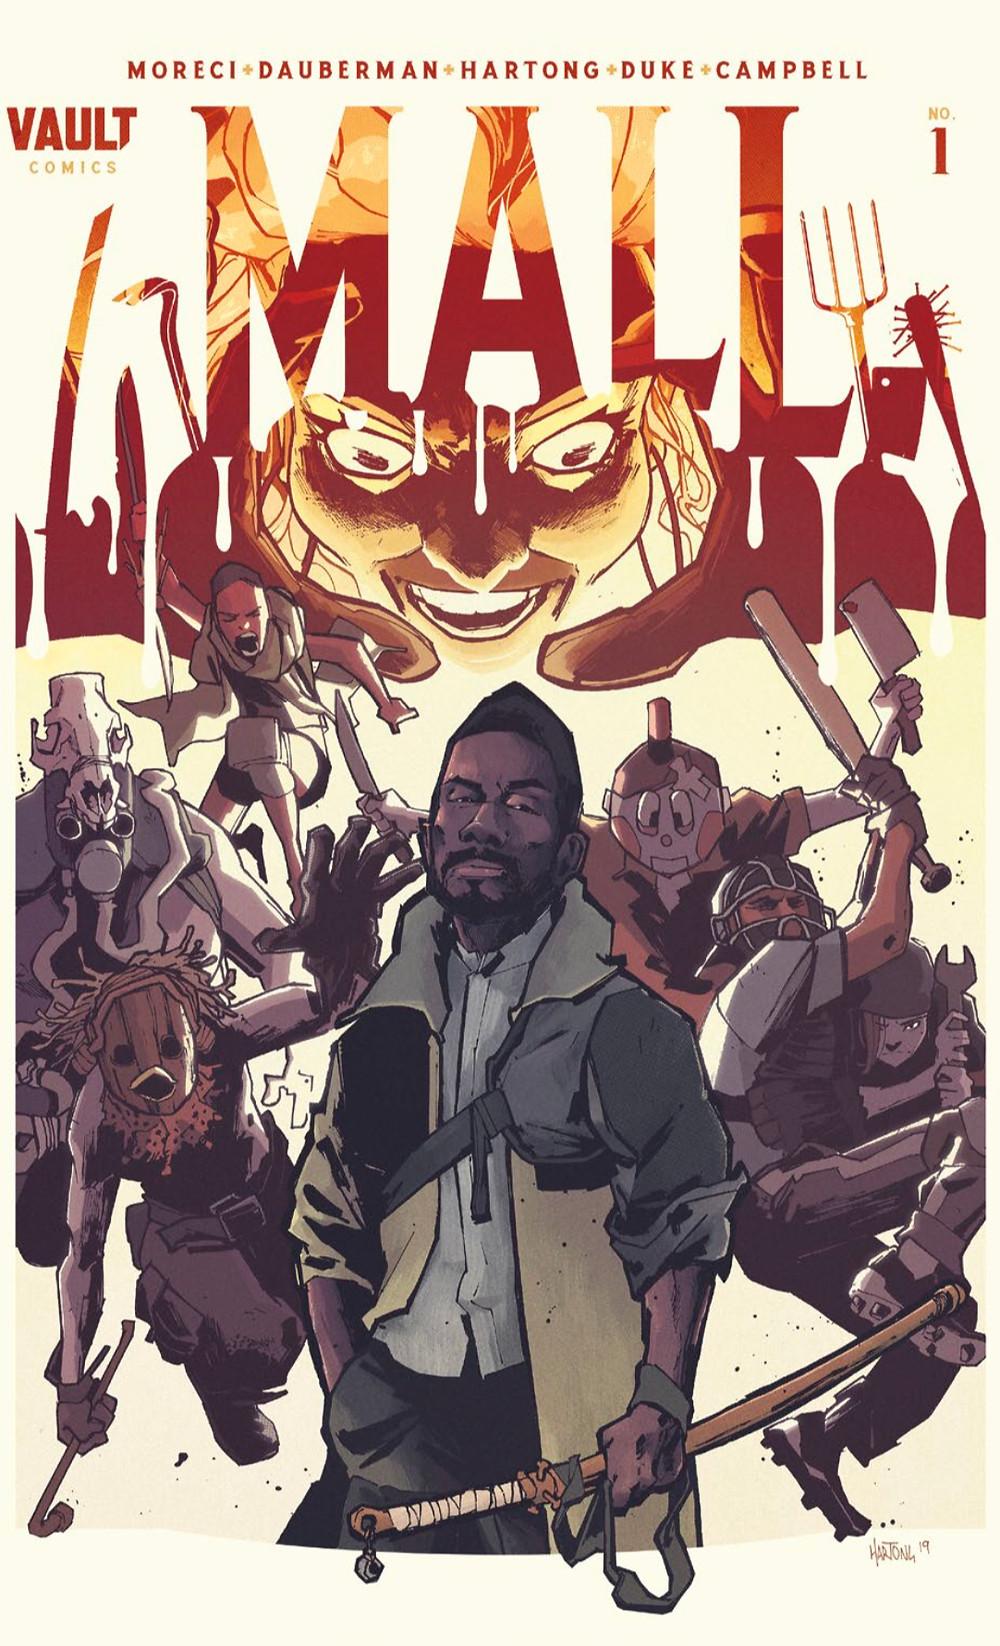 Mall, issue #1, cover, Vault Comics, Moreci/Dauberman/Hartong